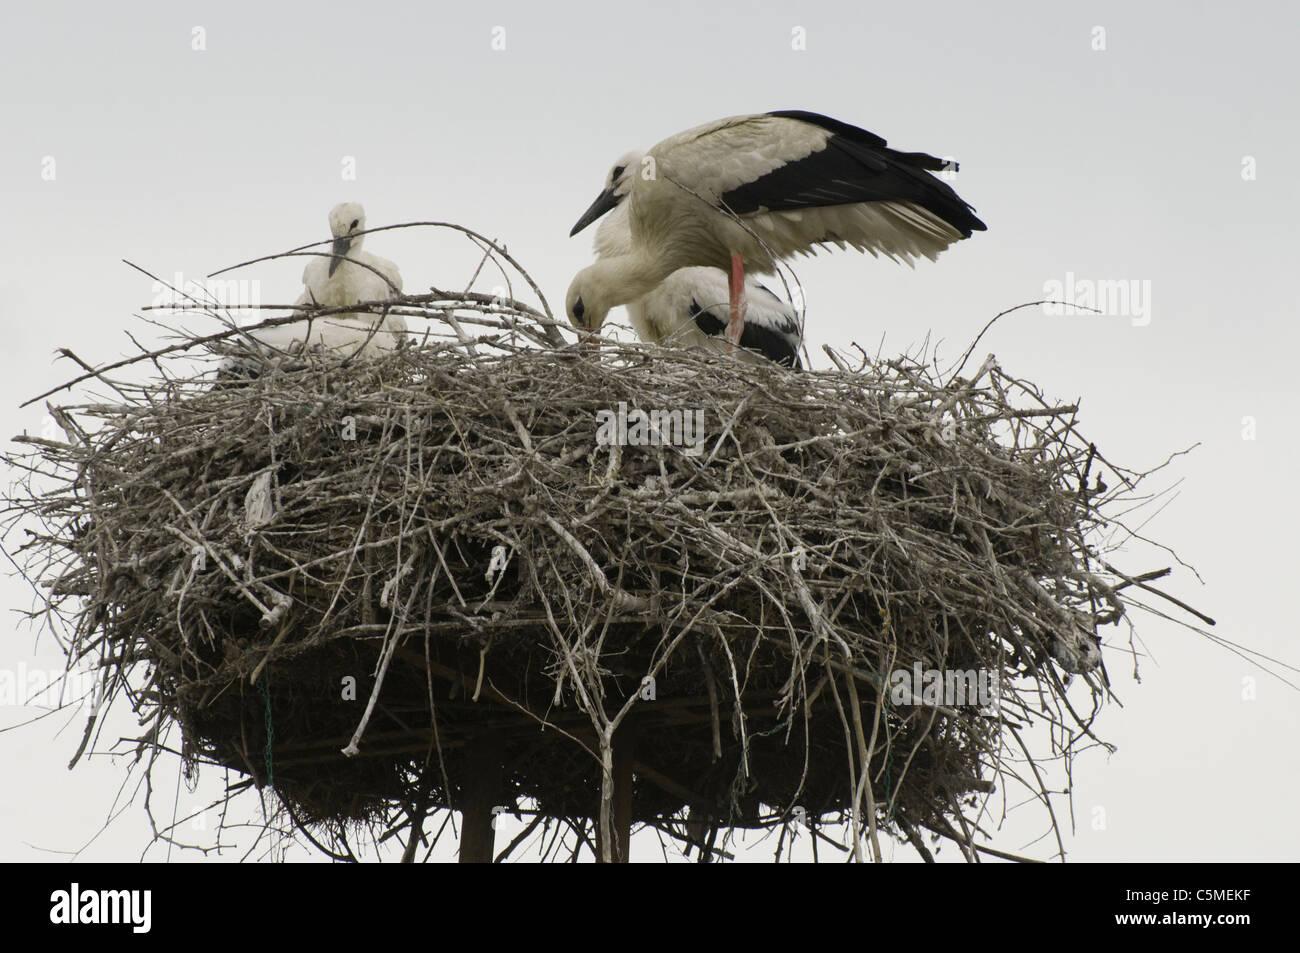 A stork feeding its fledglings in their nest, western Turkey - Stock Image